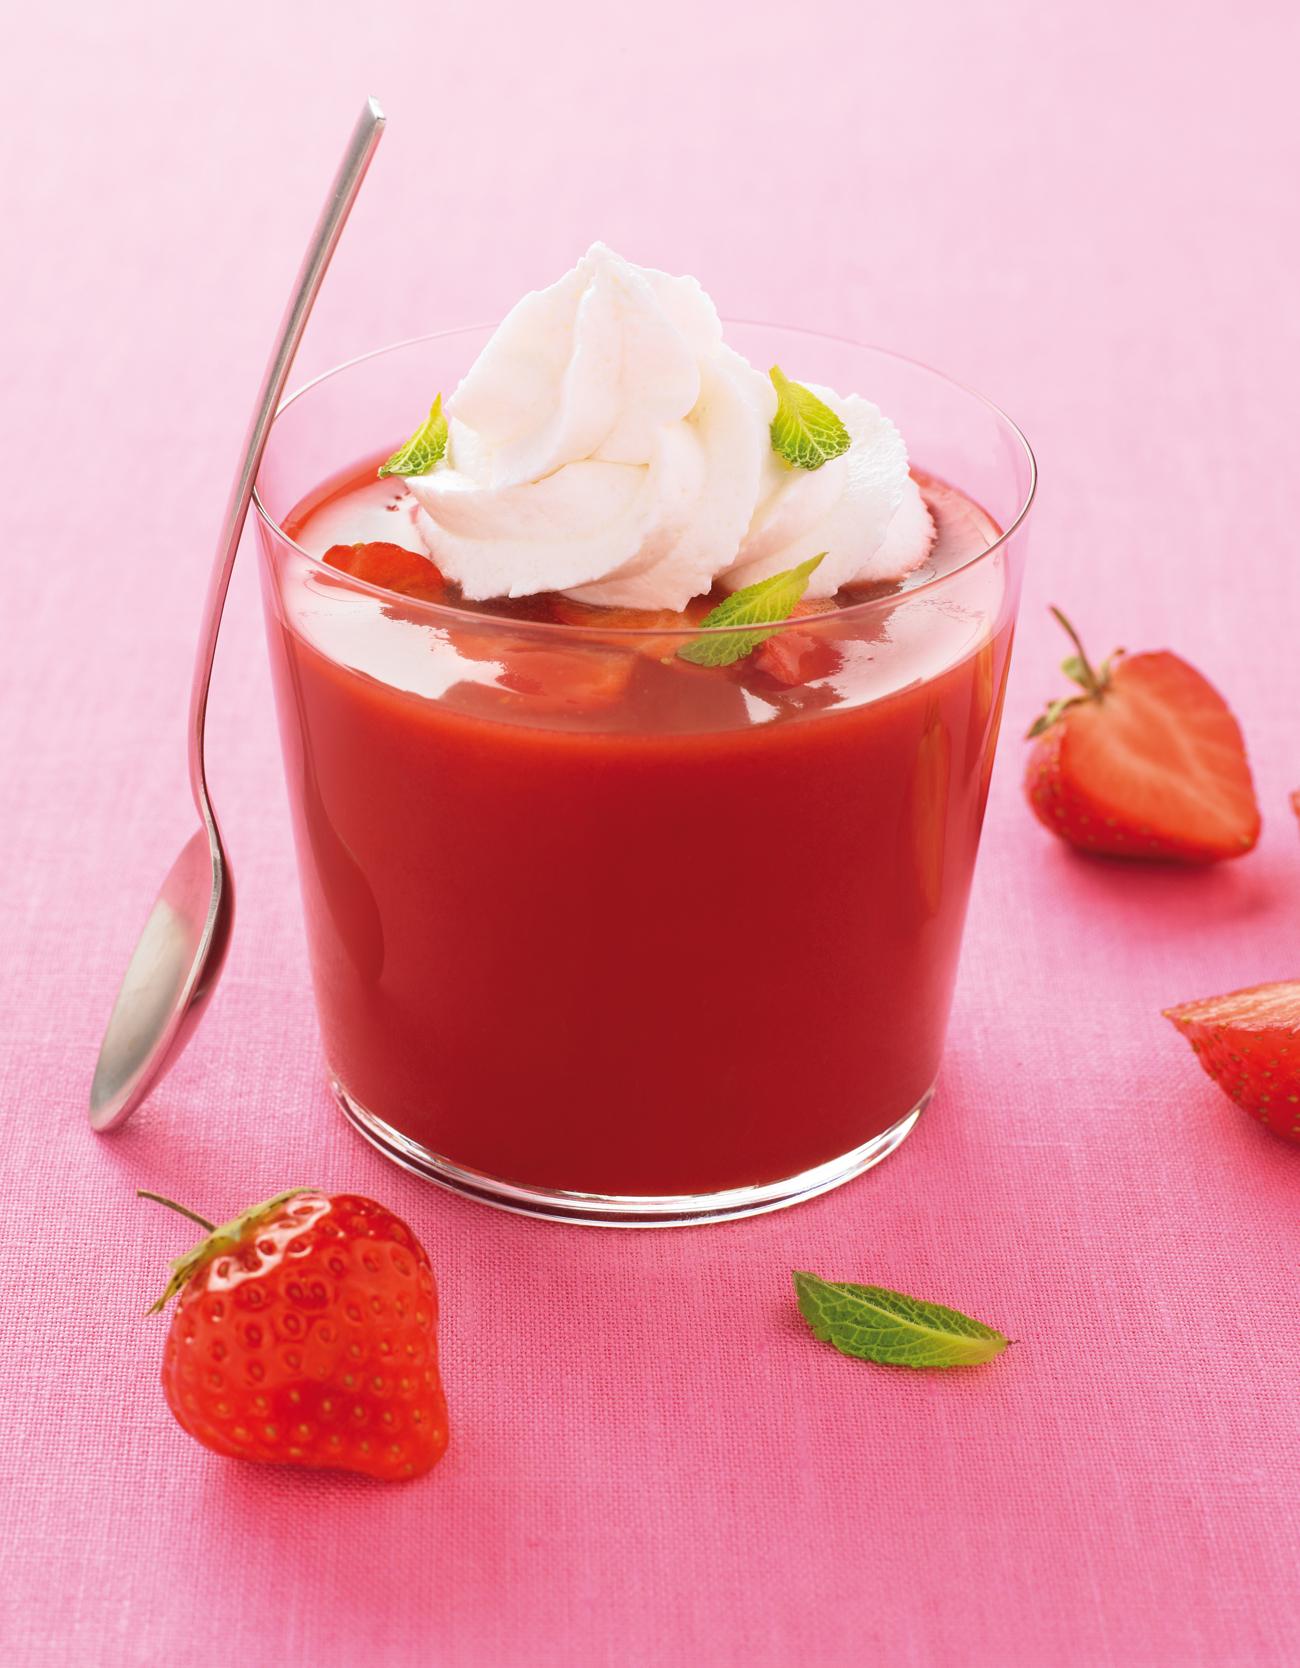 soupe chantilly_Soupe_de_fraise_Andros 2